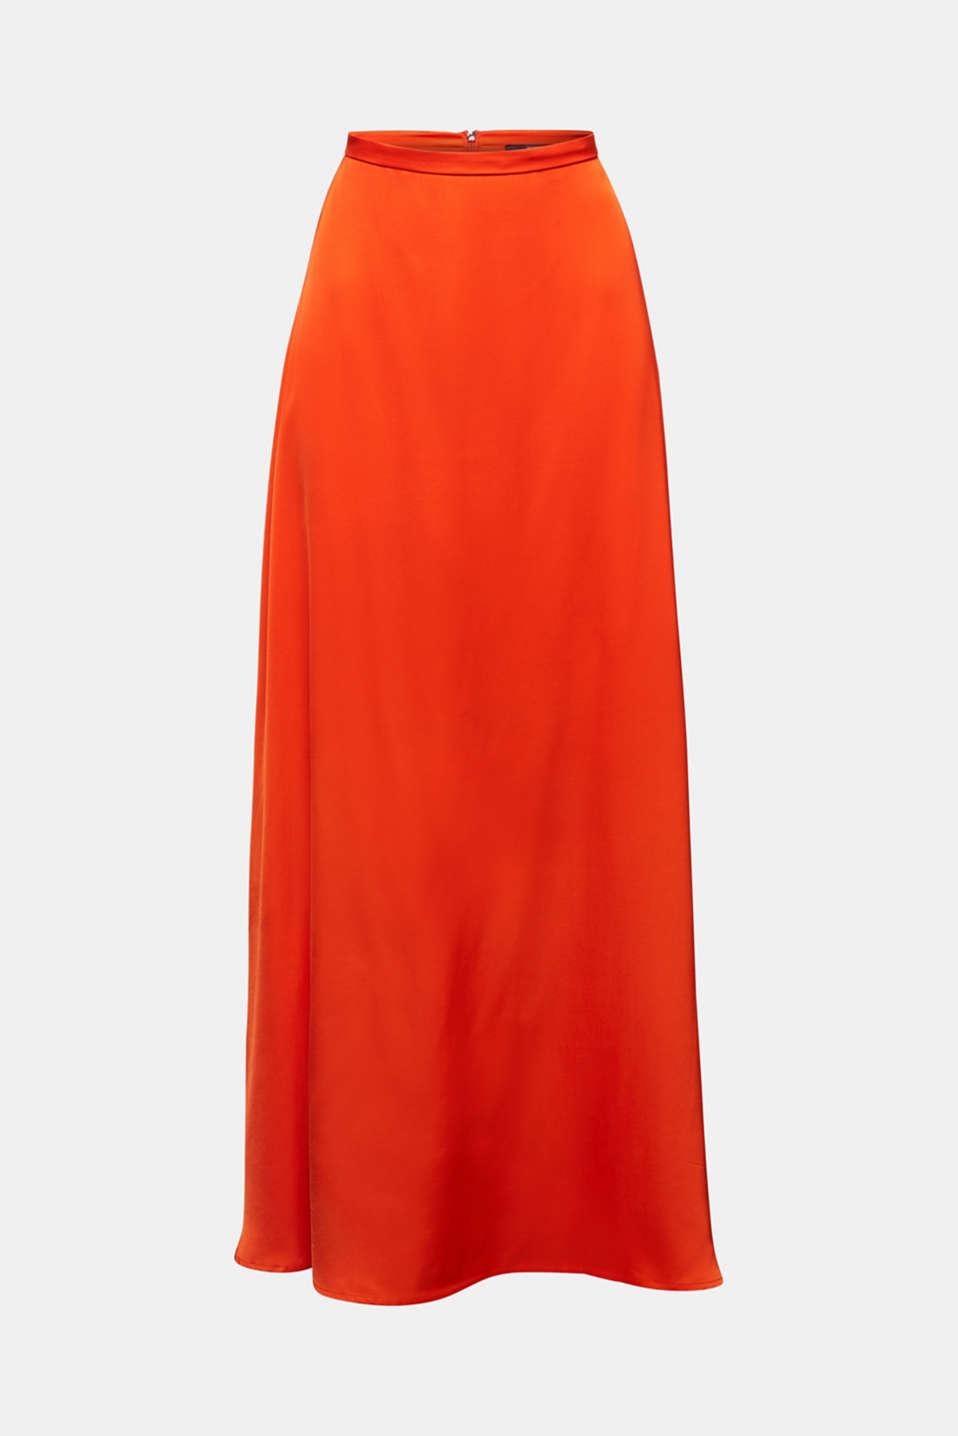 Maxi skirt made of viscose satin, RED ORANGE, detail image number 6